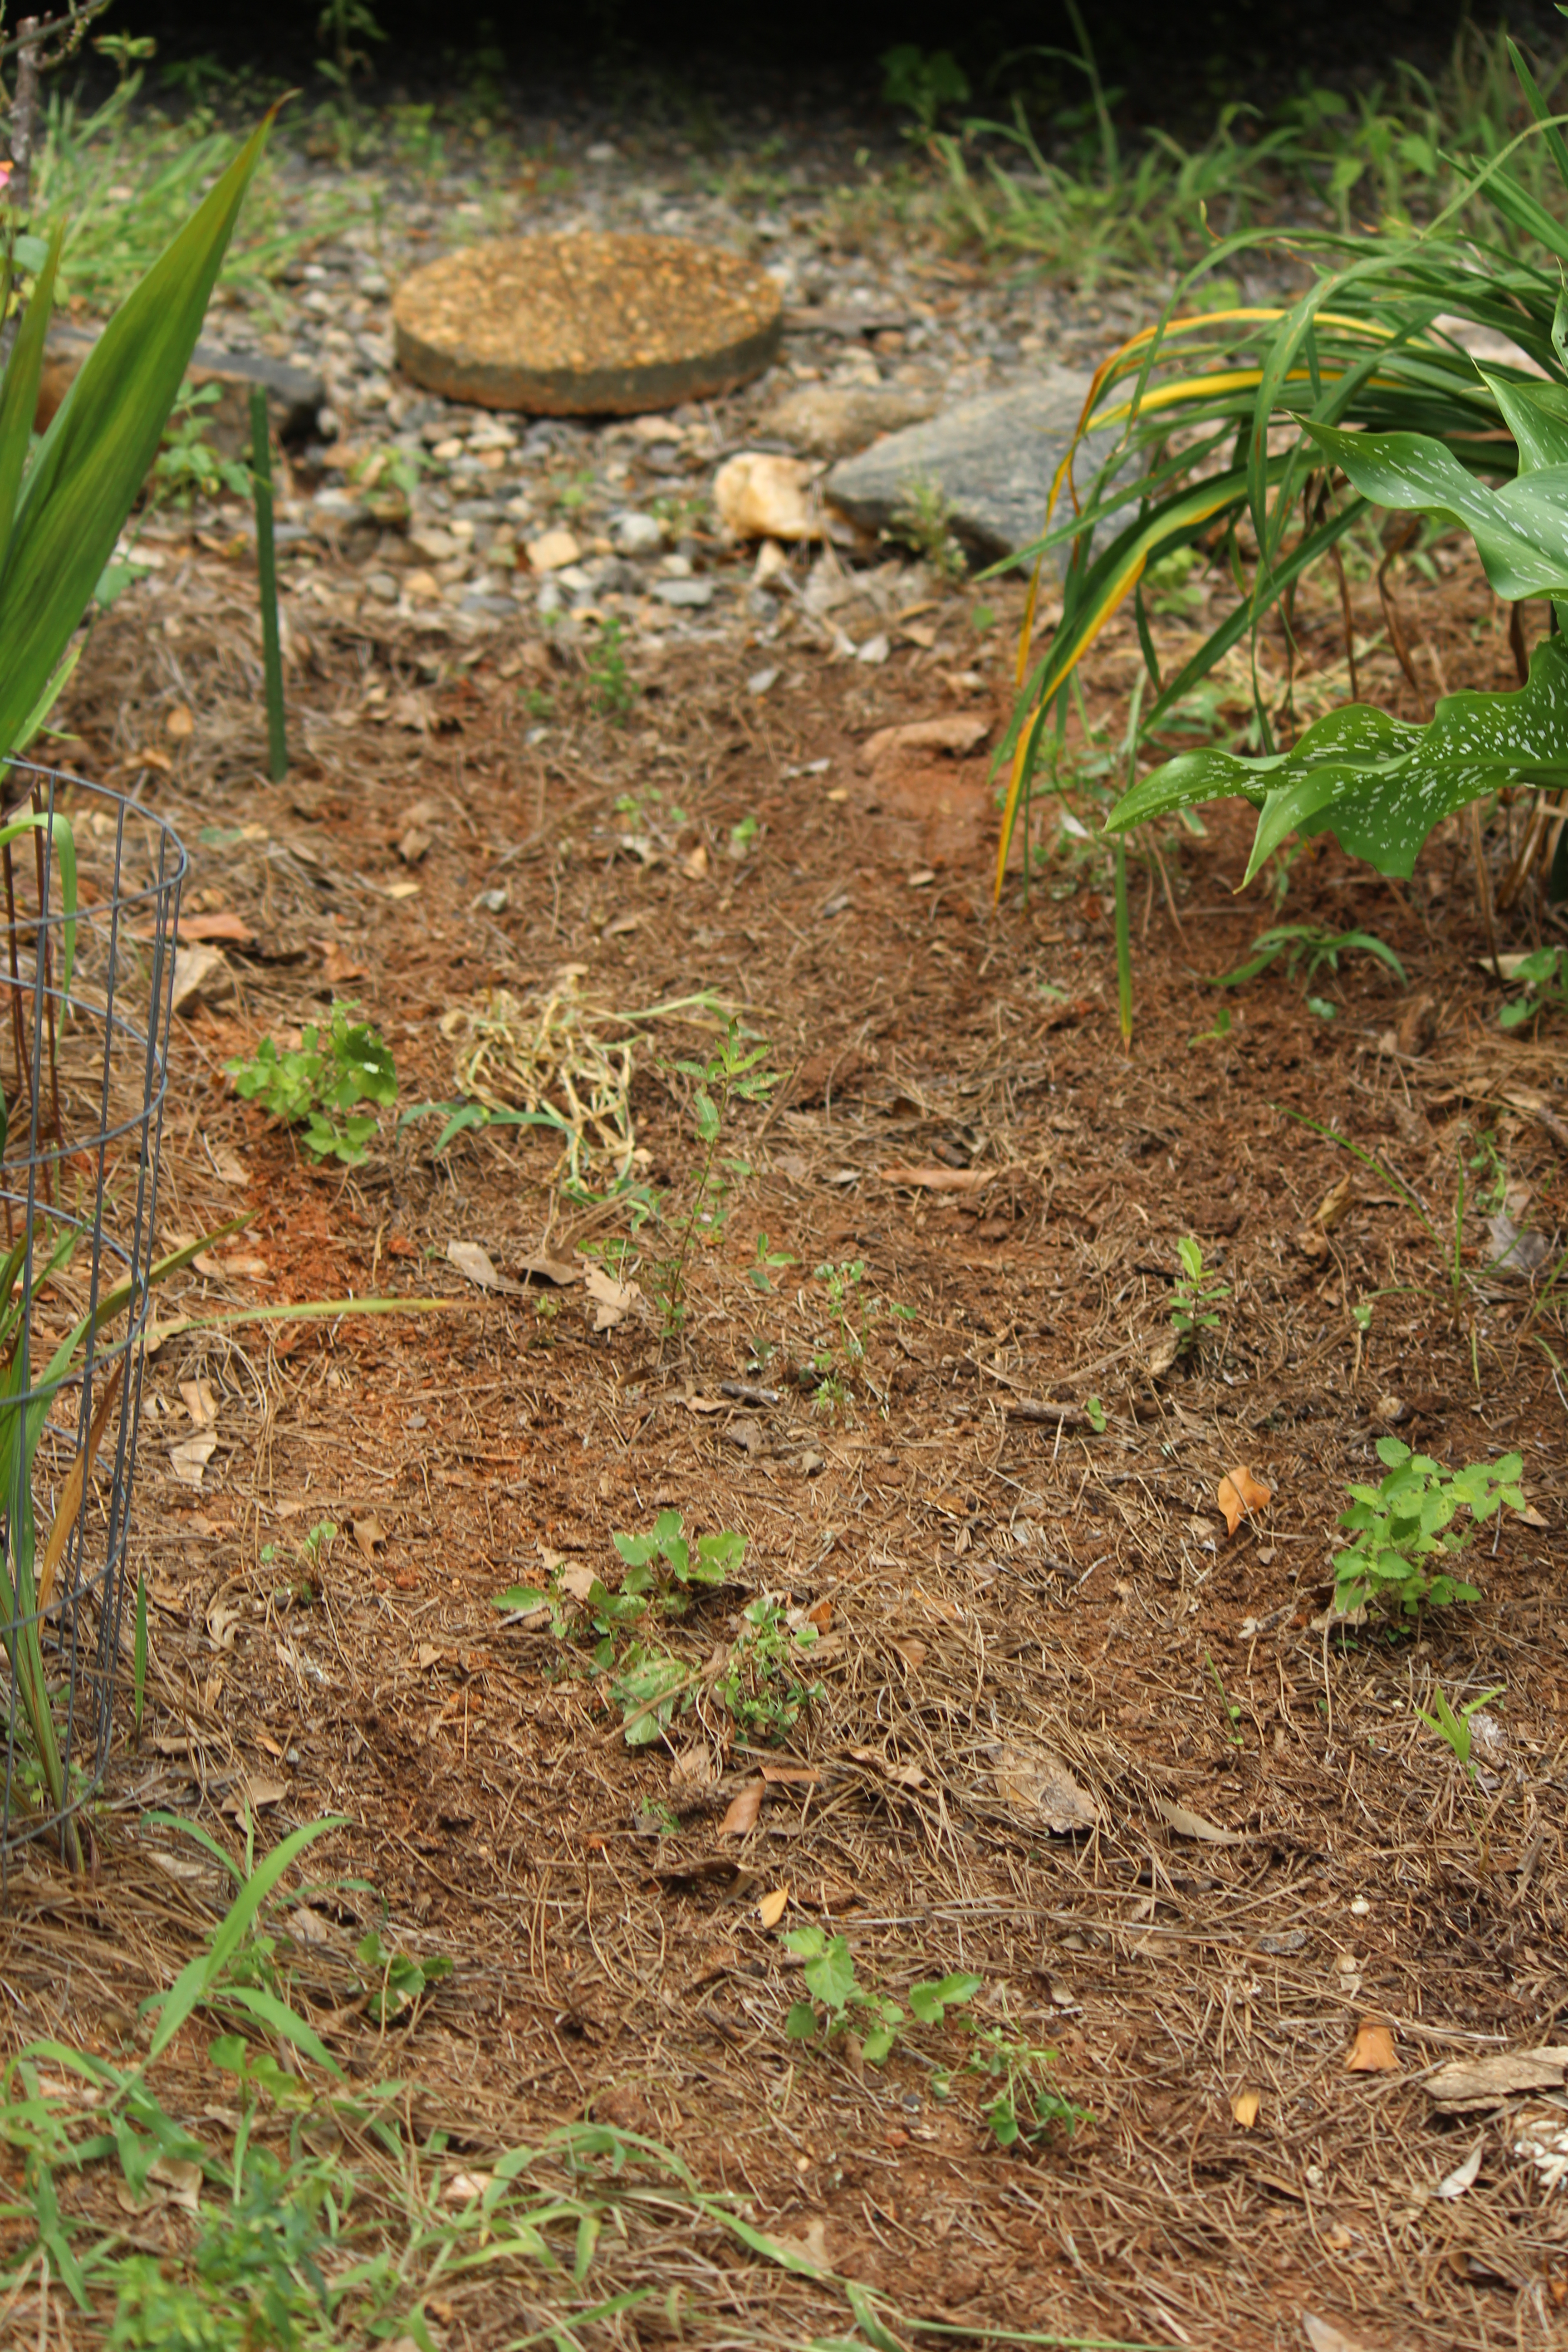 stepping i landscaping gardening flower pinterest and stone landscapingdecorative ornamental stones co of types satuska decor uk garden beds decorative mulch